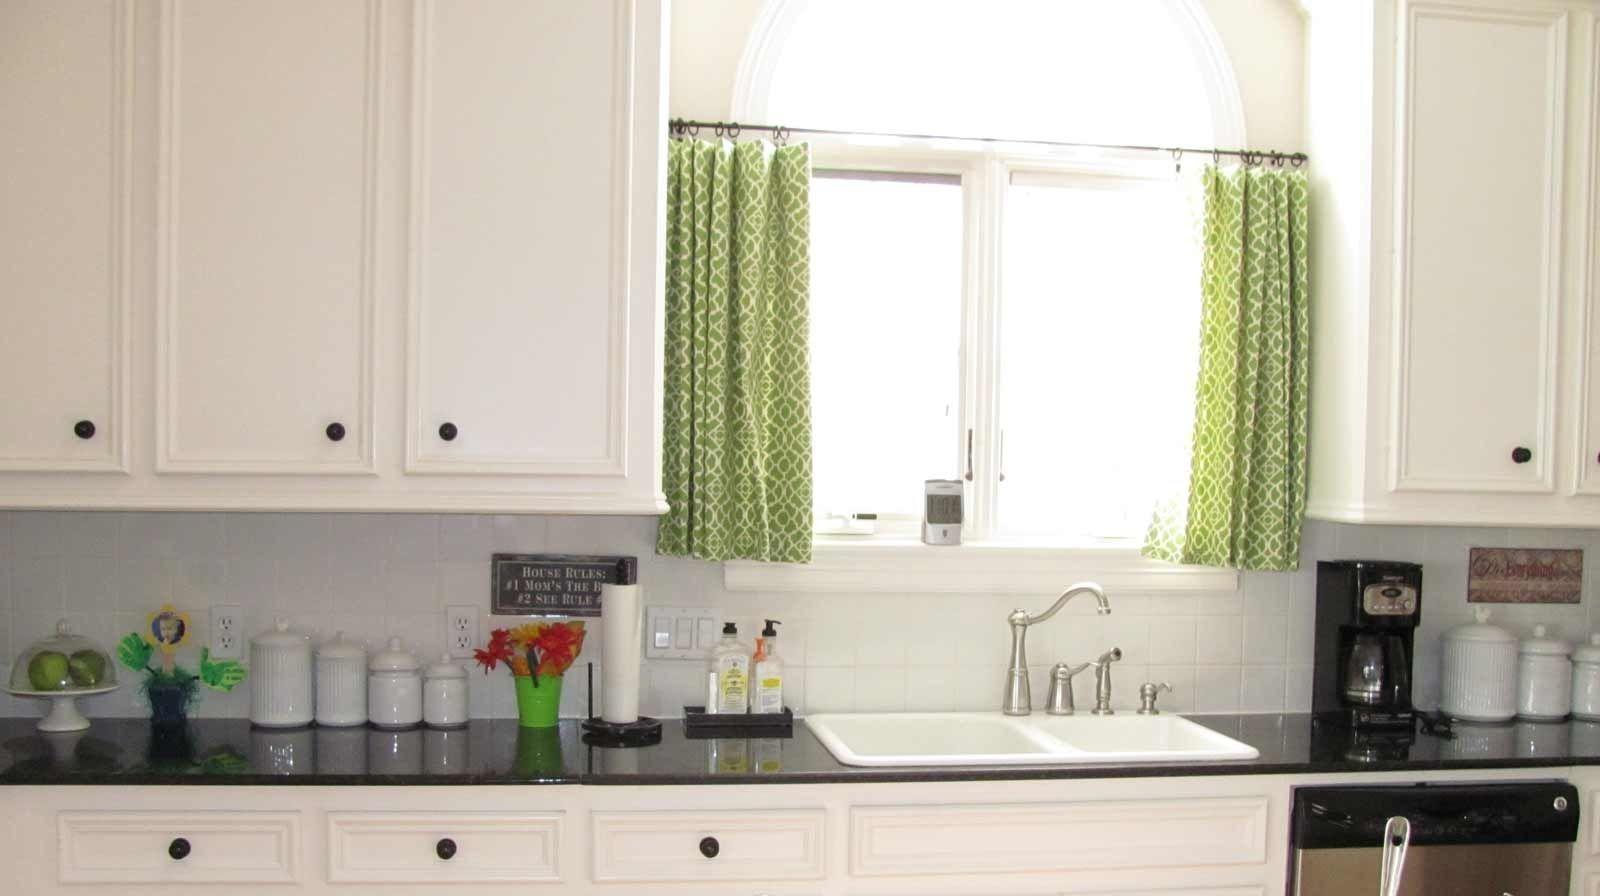 Cafe Curtains For Kitchen Window   http://navigator-spb.info ...